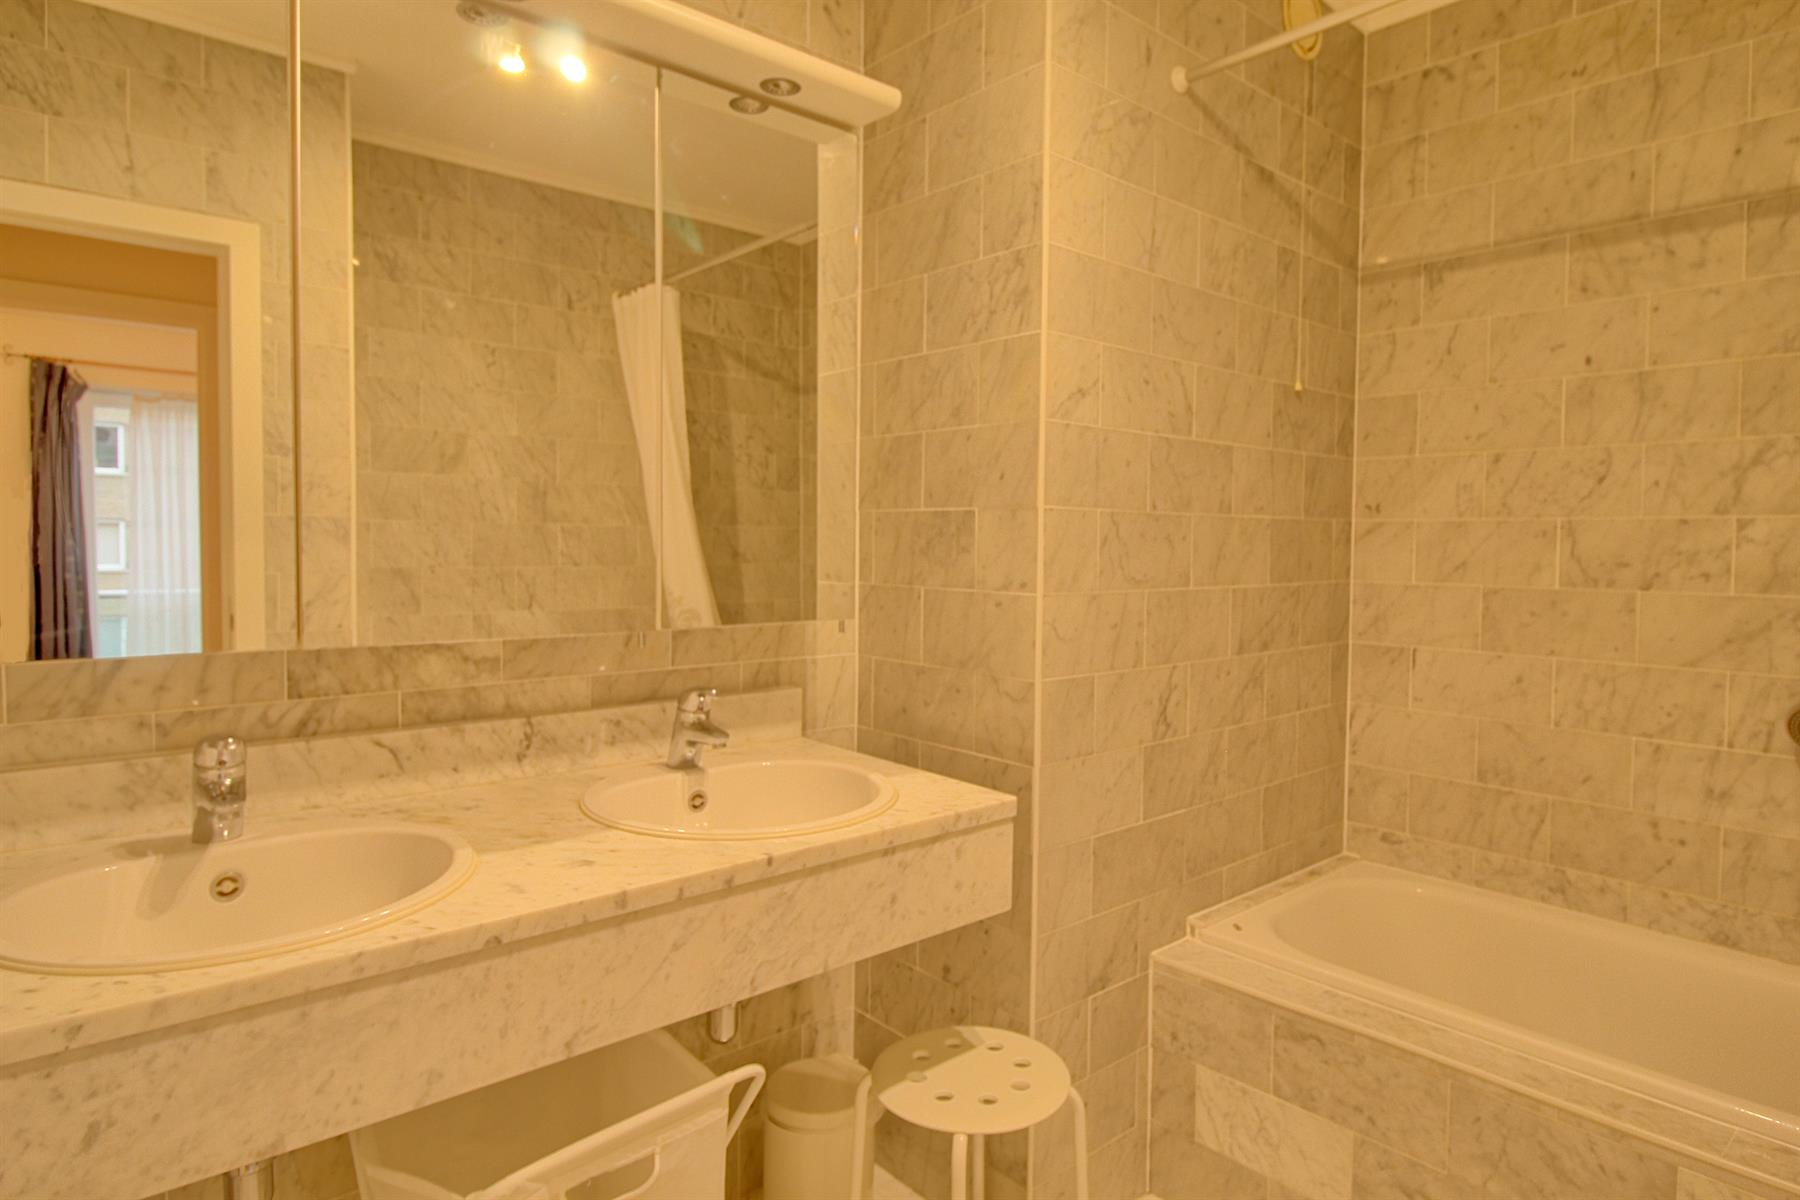 Appartement - Woluwe-Saint-Lambert - #4208881-5